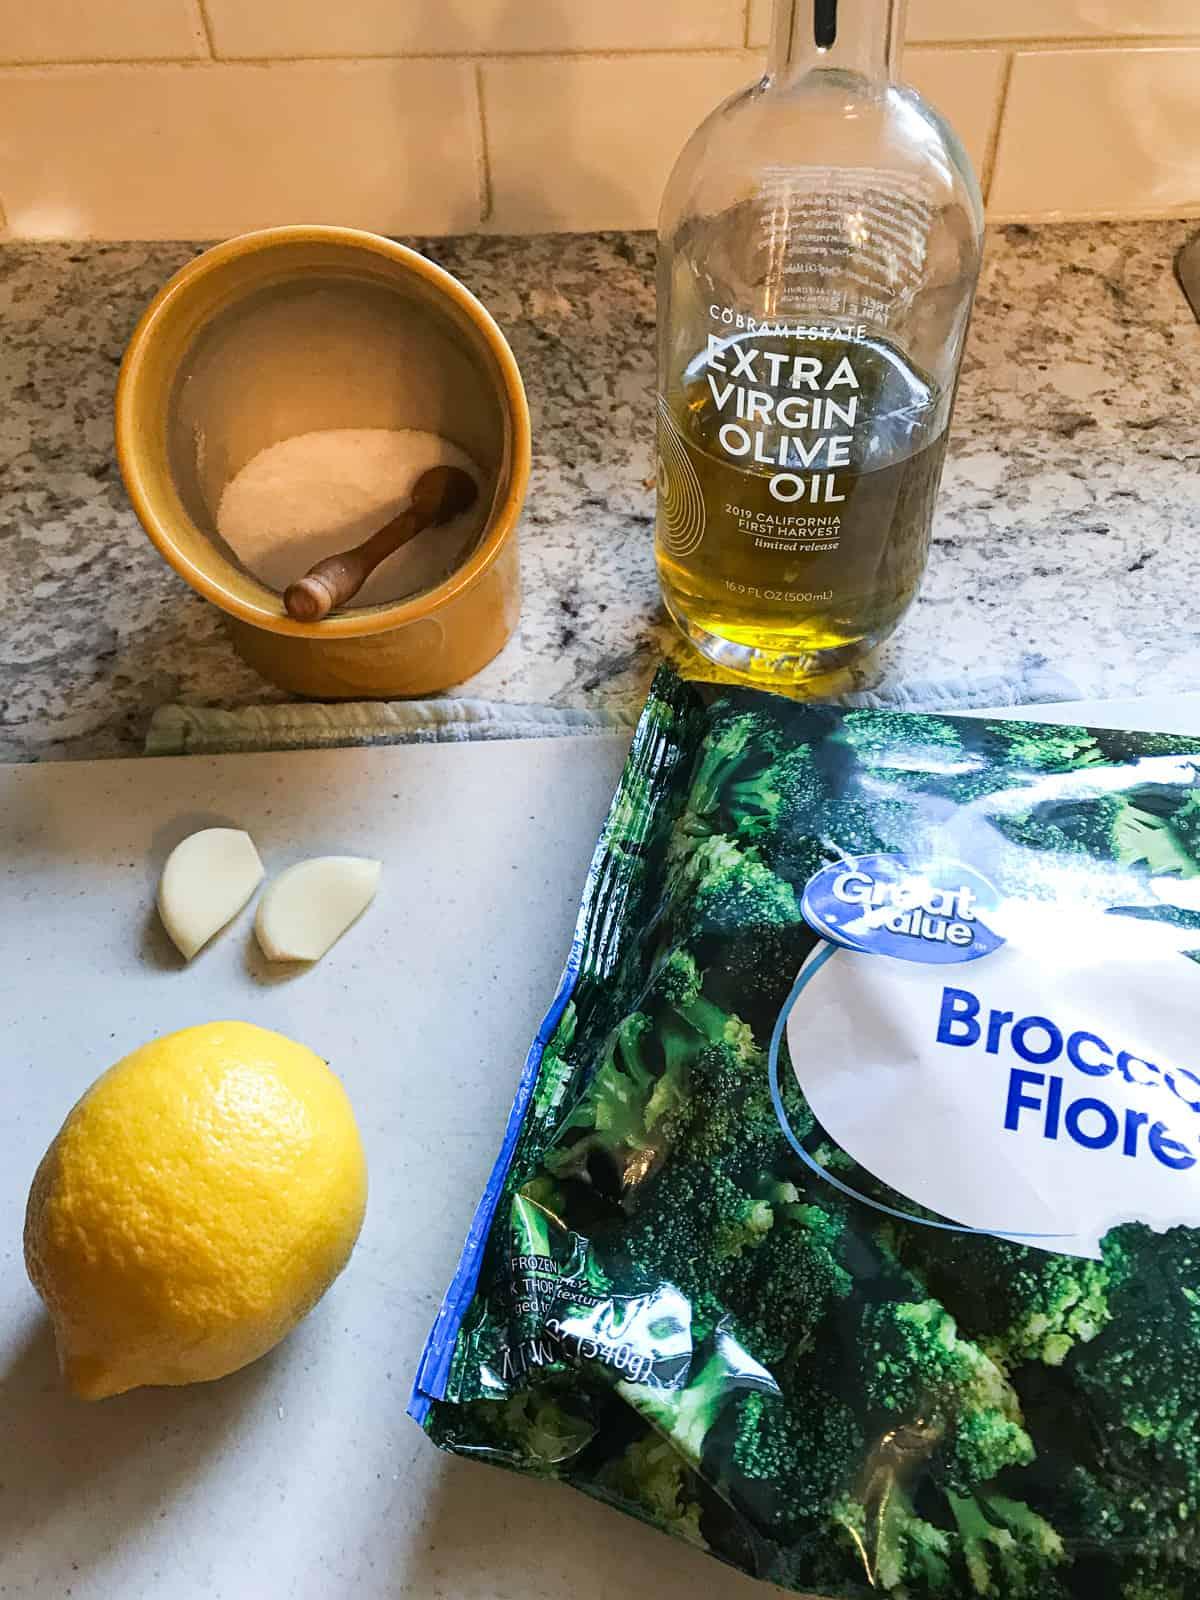 Ingredients for cooking frozen broccoli. Salt, olive oil, bag of broccoli florets, lemon, and two cloves of garlic.